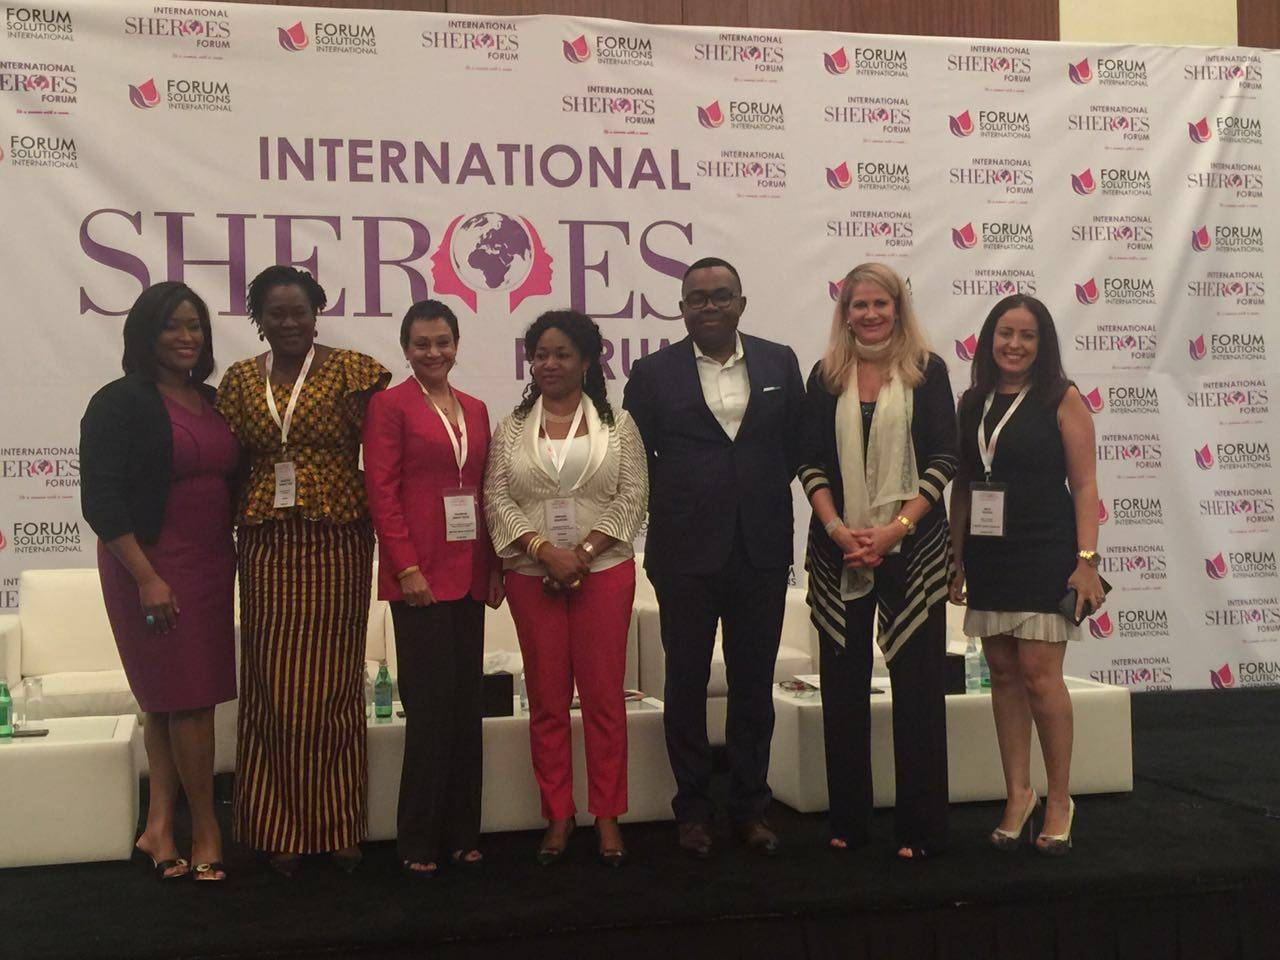 Panelists at SHEROES International Forum, Dubai.